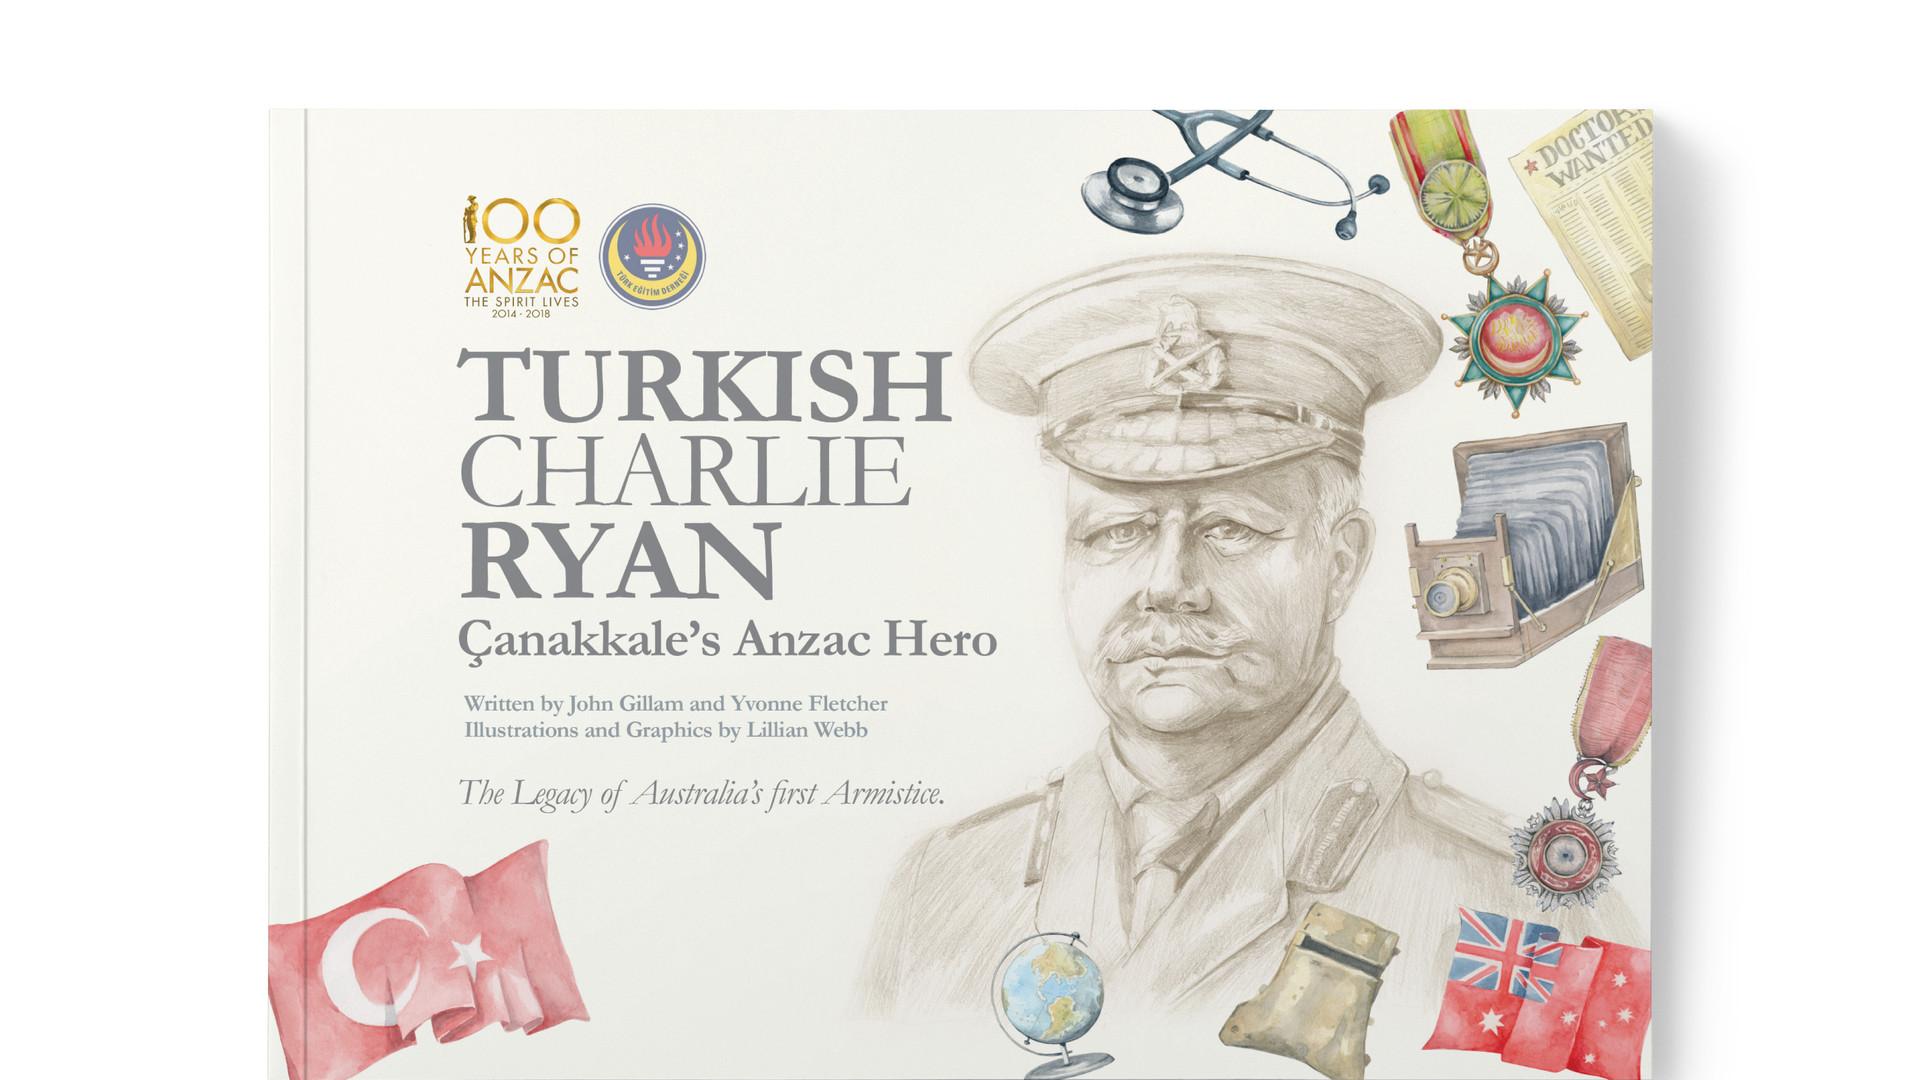 Turkish Charlie Ryan Canakkale's Anzac Hero